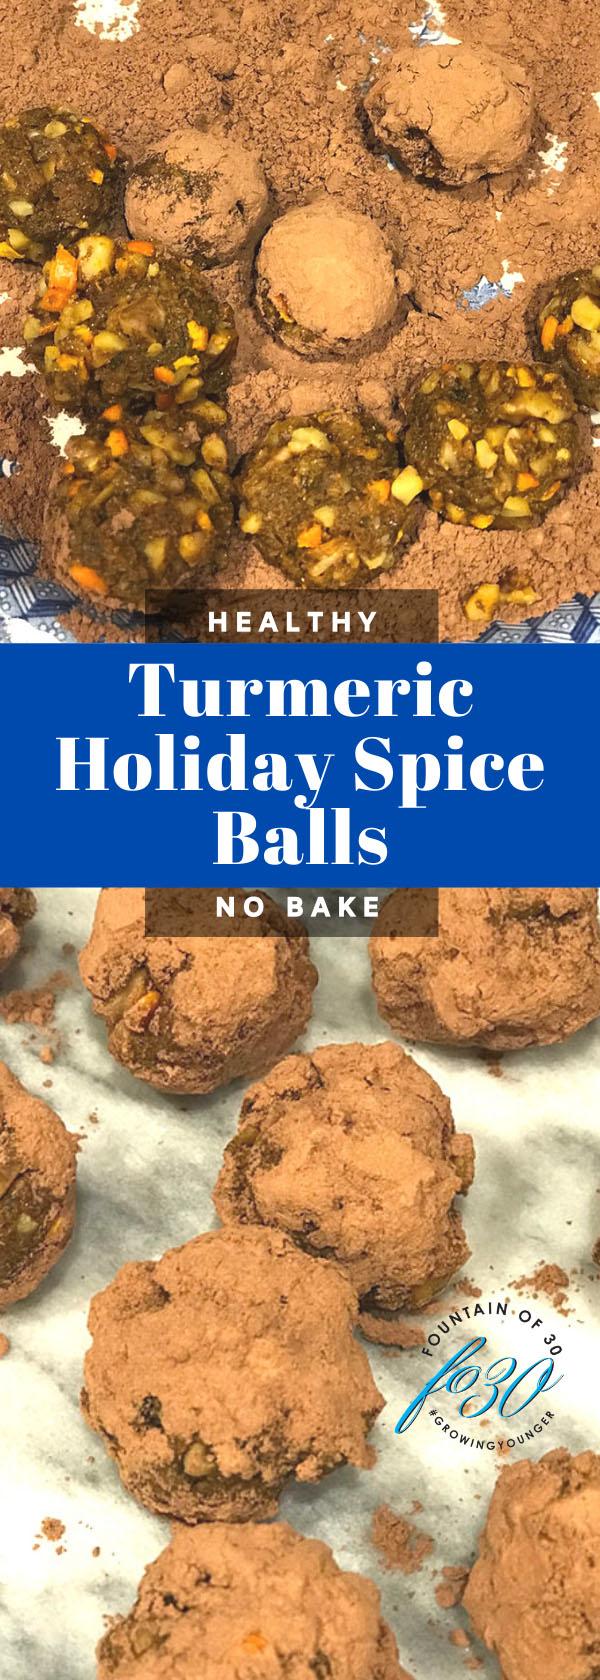 turmeric balls recipe fountainof30